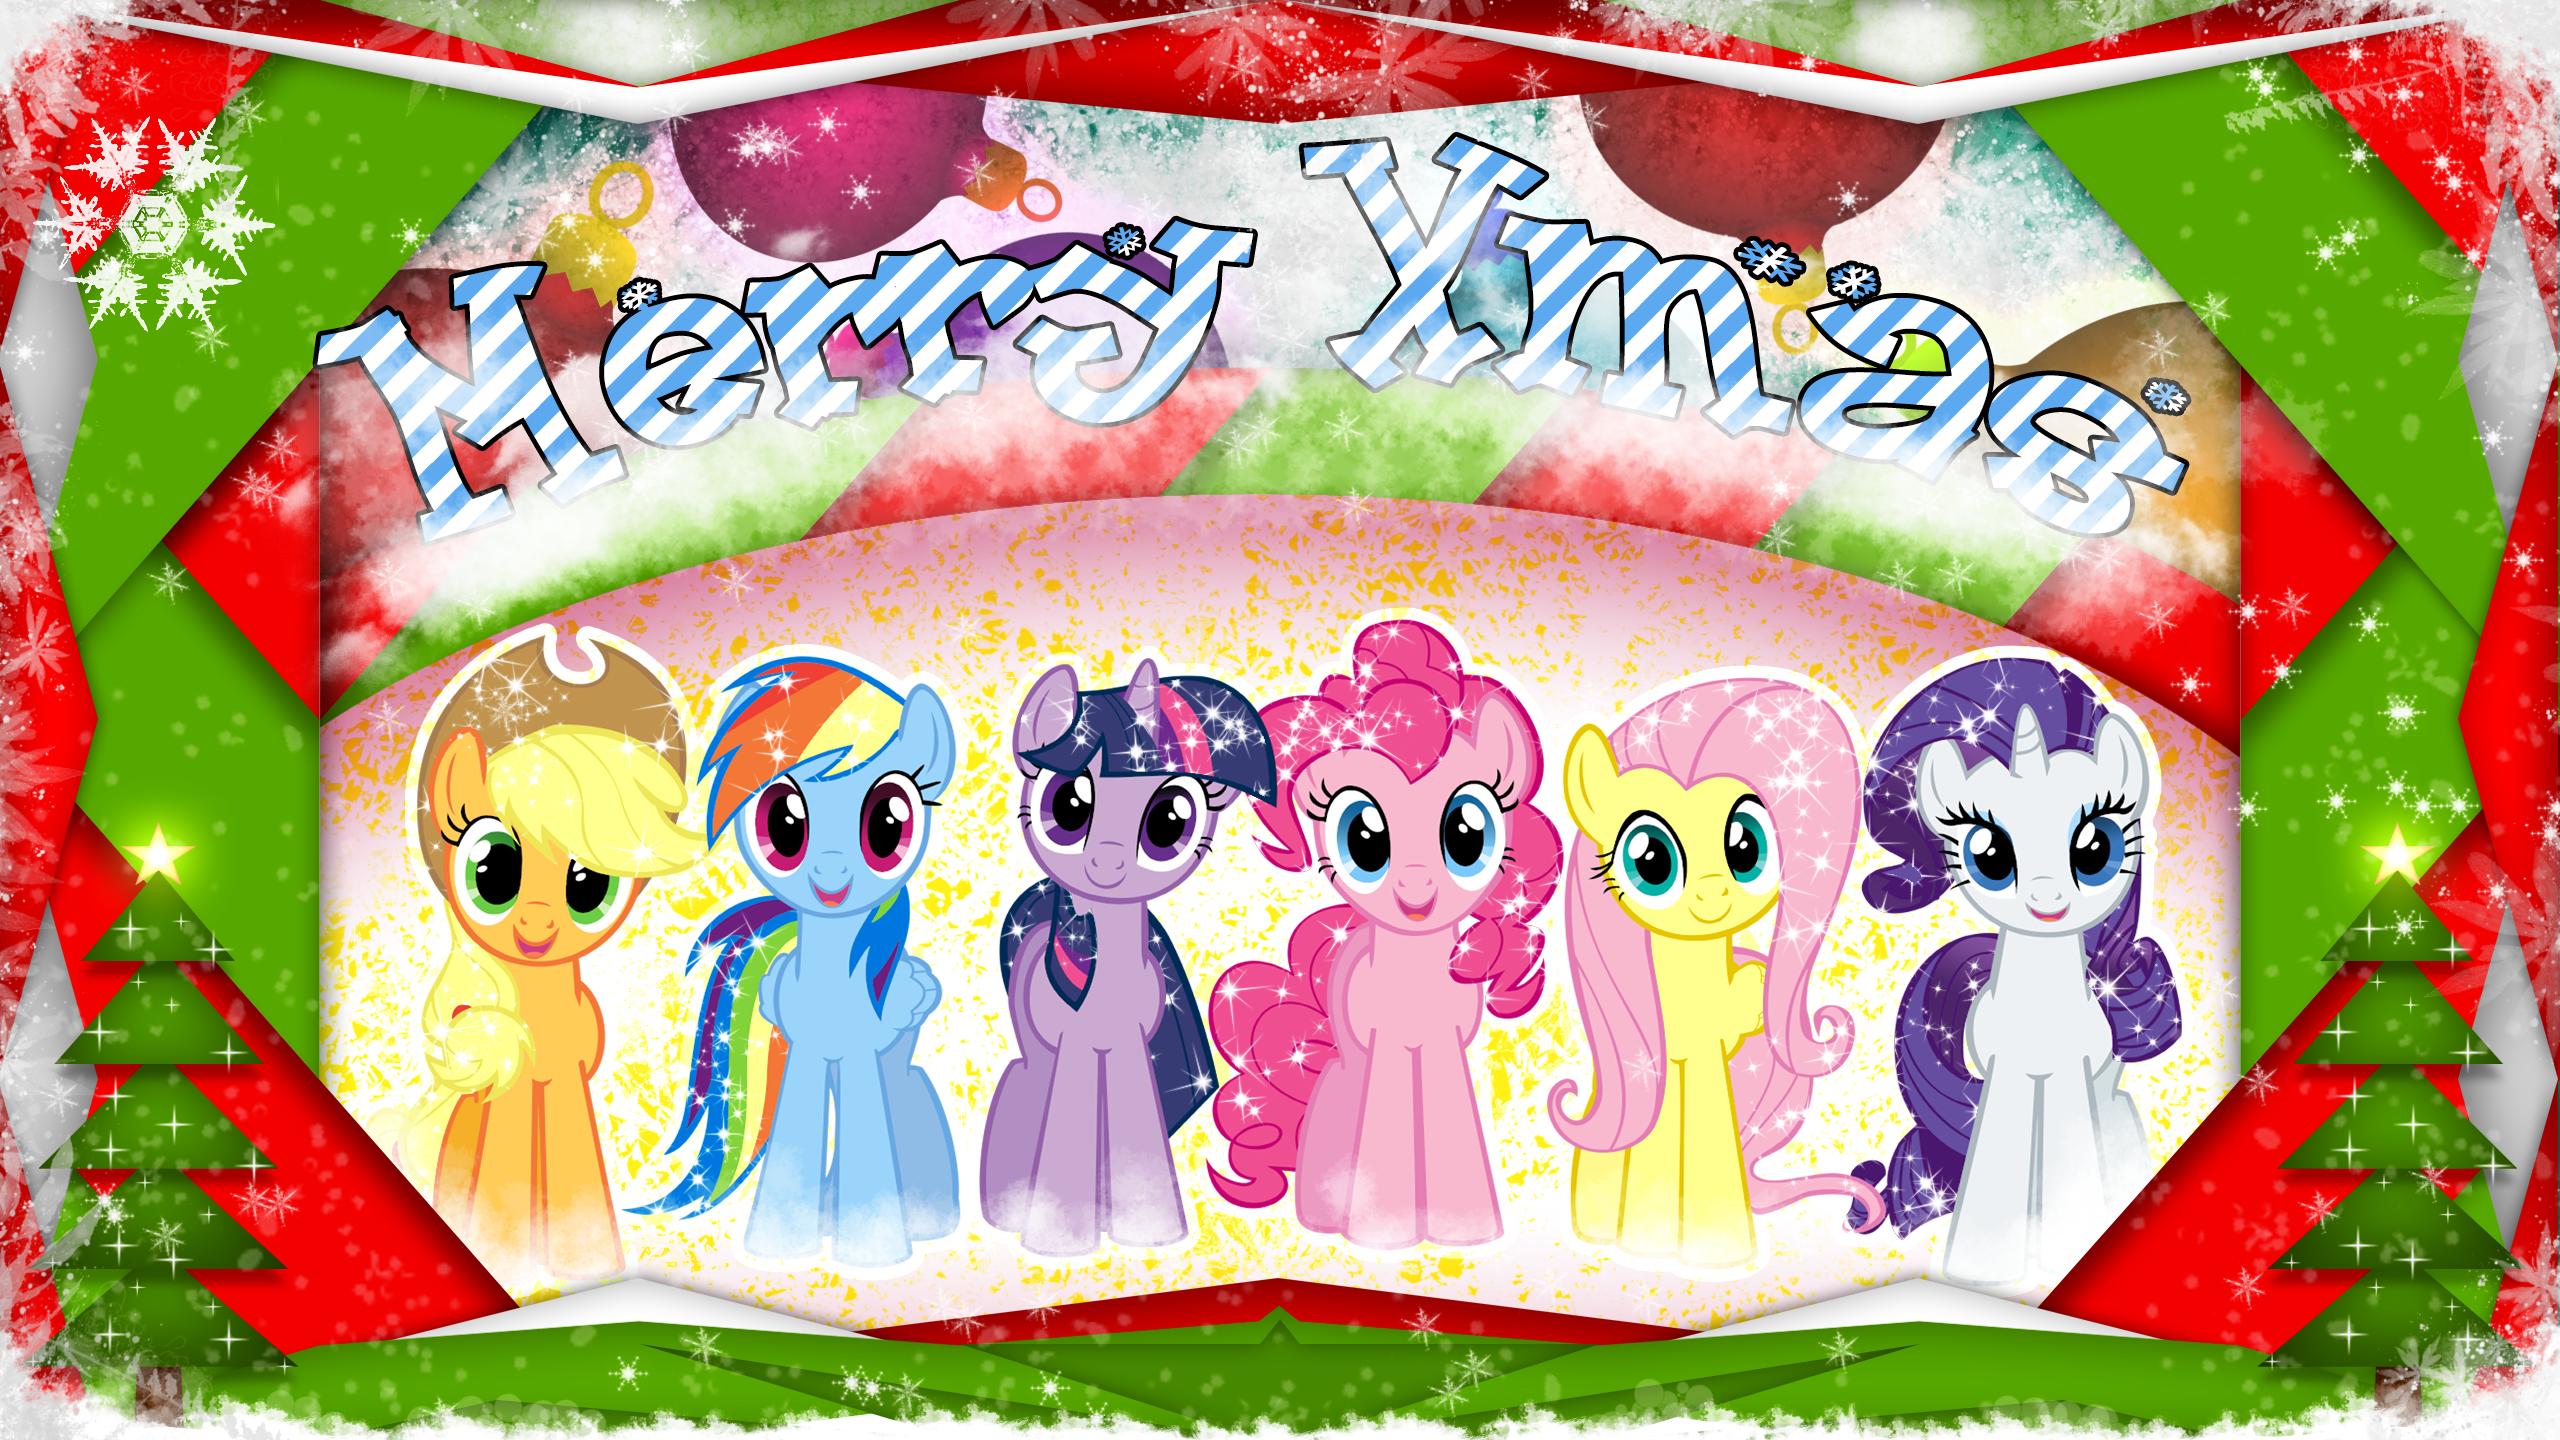 Mane 6 Merry Xmas wallpaper by JaySk8 and skrayp